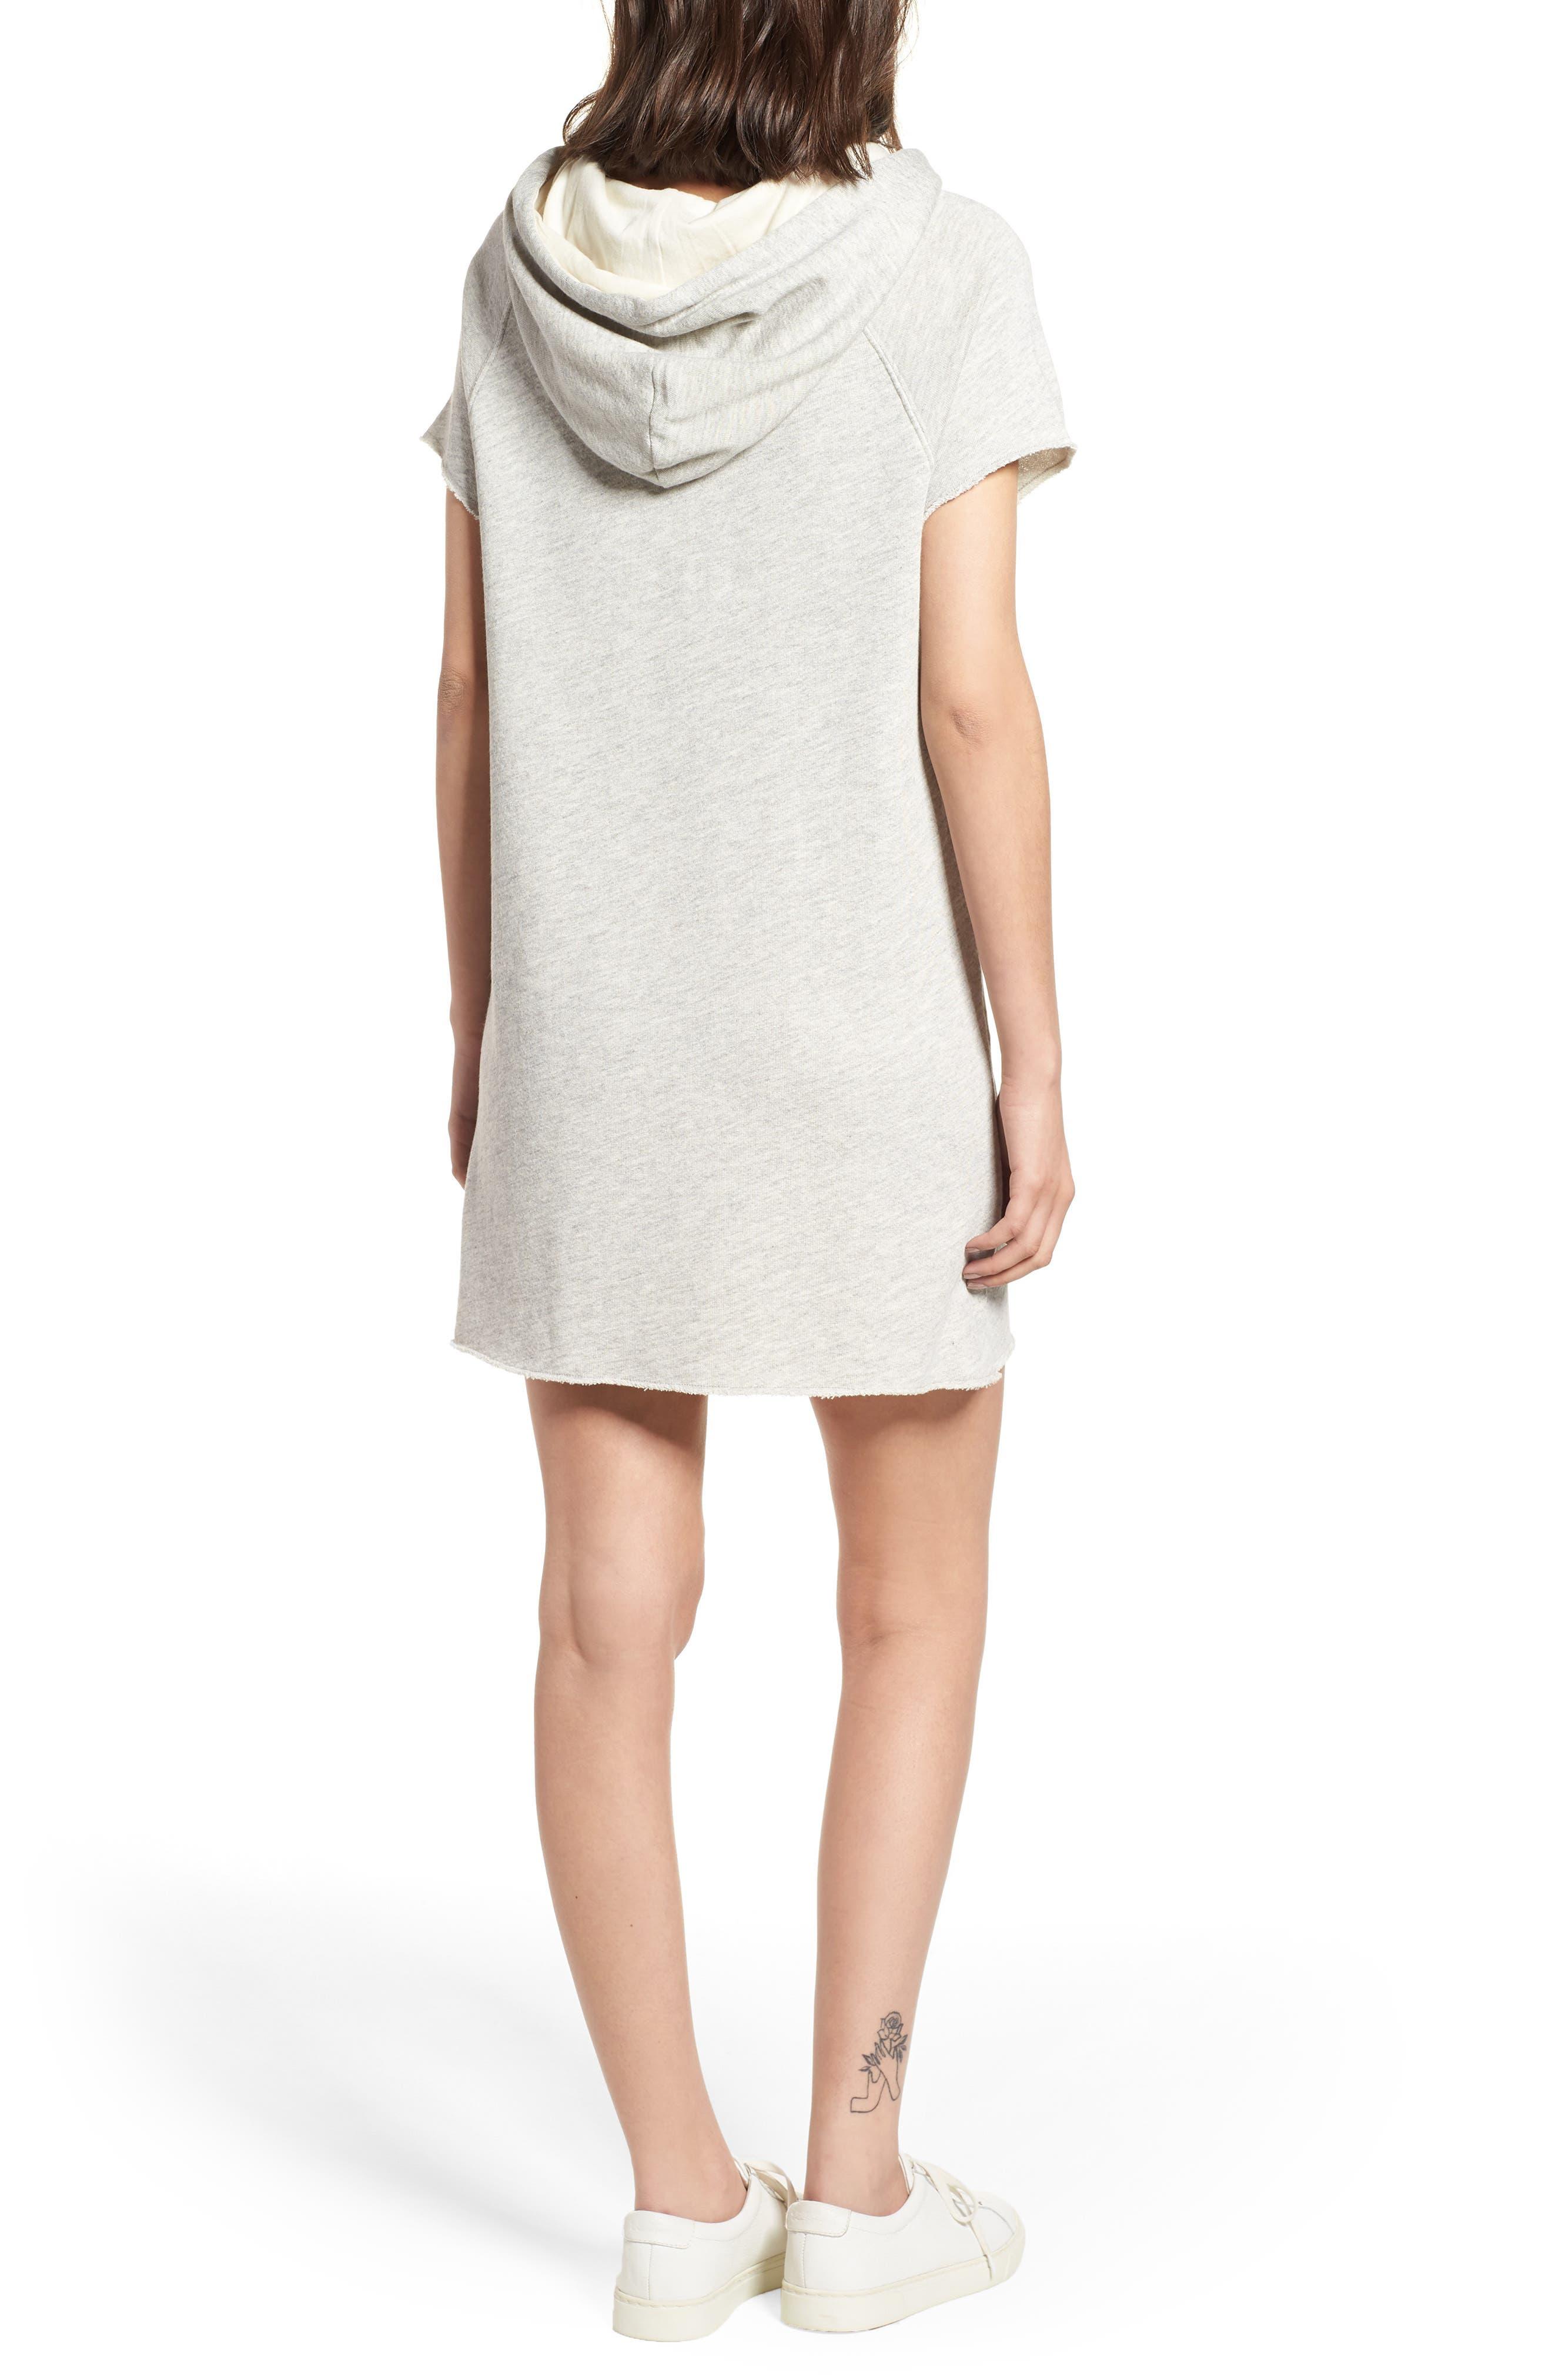 Spades Hoodie Dress,                             Alternate thumbnail 2, color,                             020